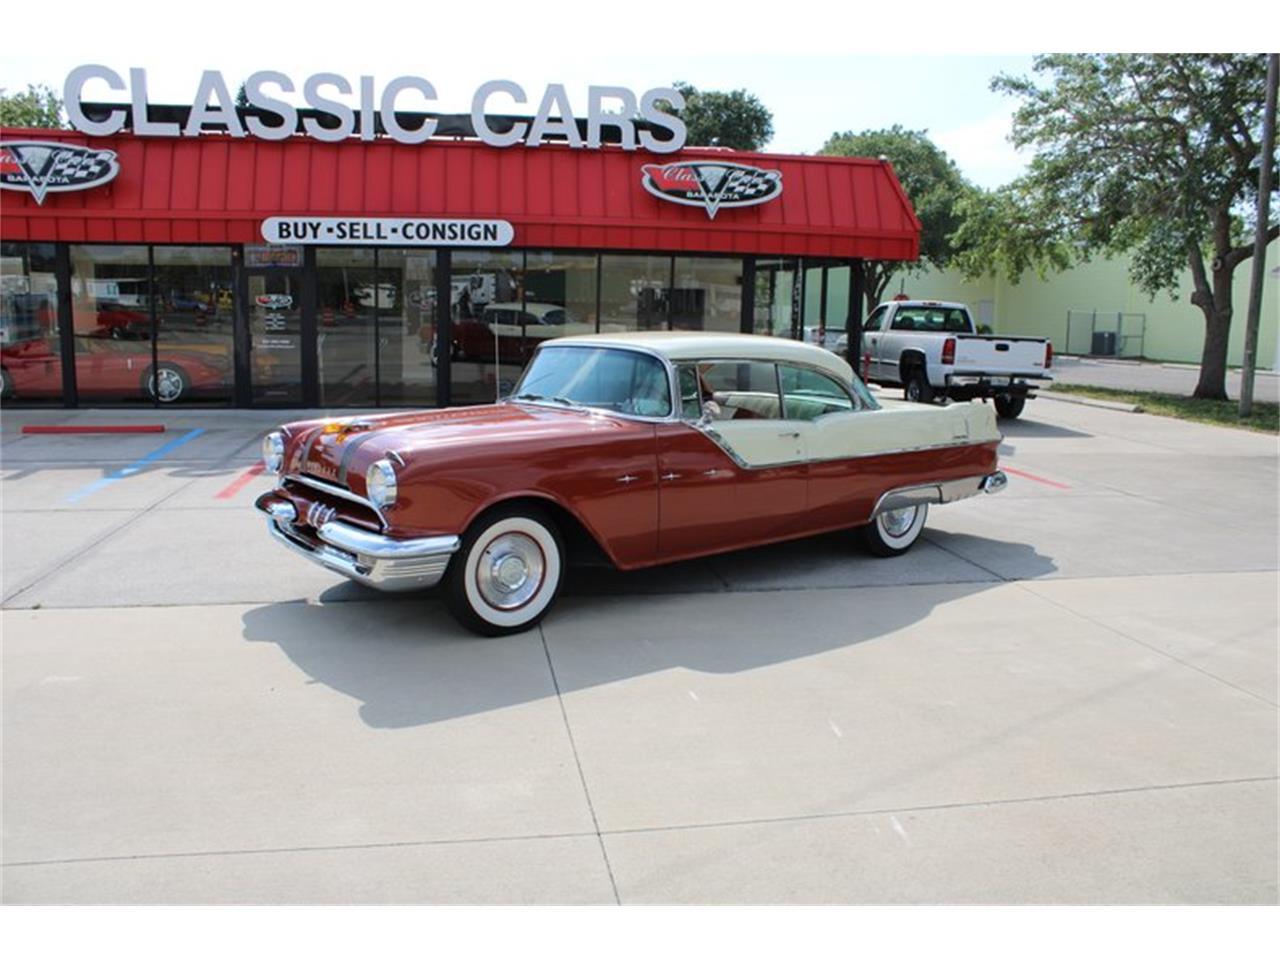 For Sale: 1955 Pontiac Star Chief in Sarasota, Florida